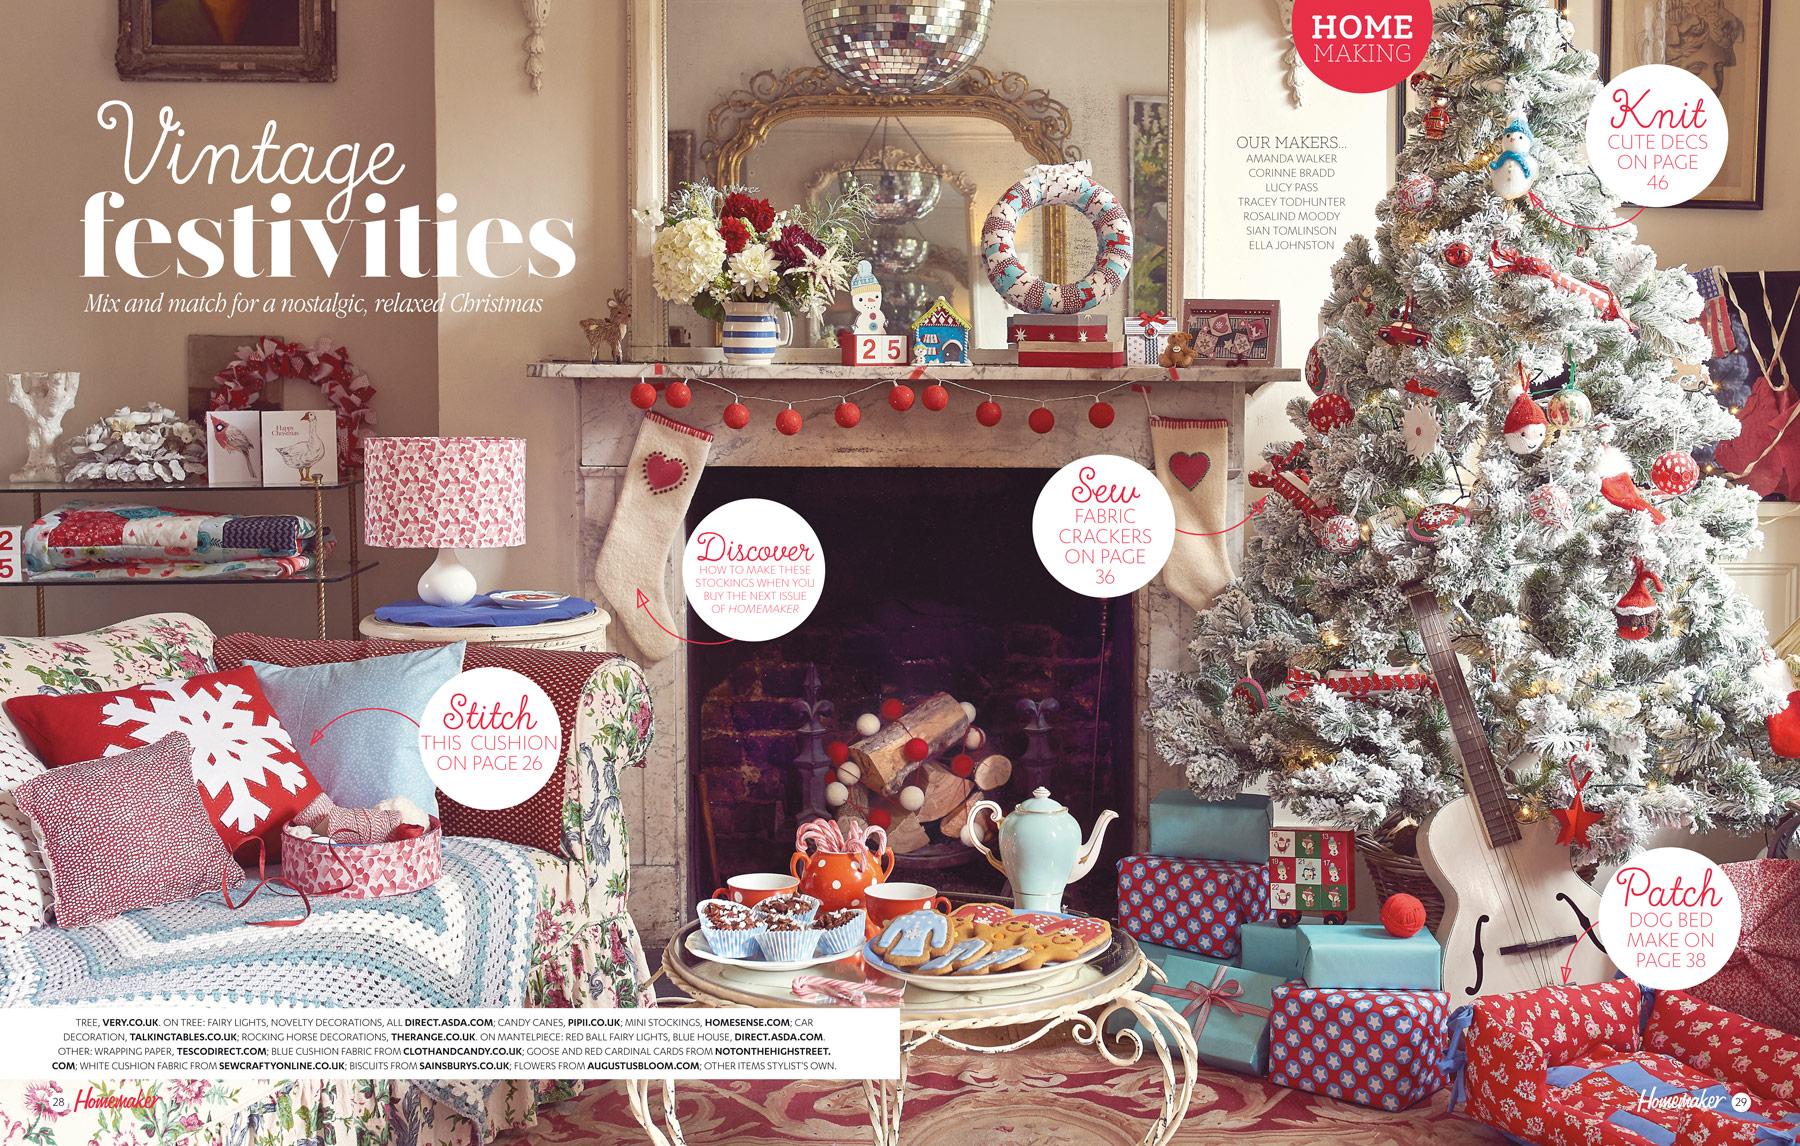 Cath Kidston inspired vintage Christmas living room